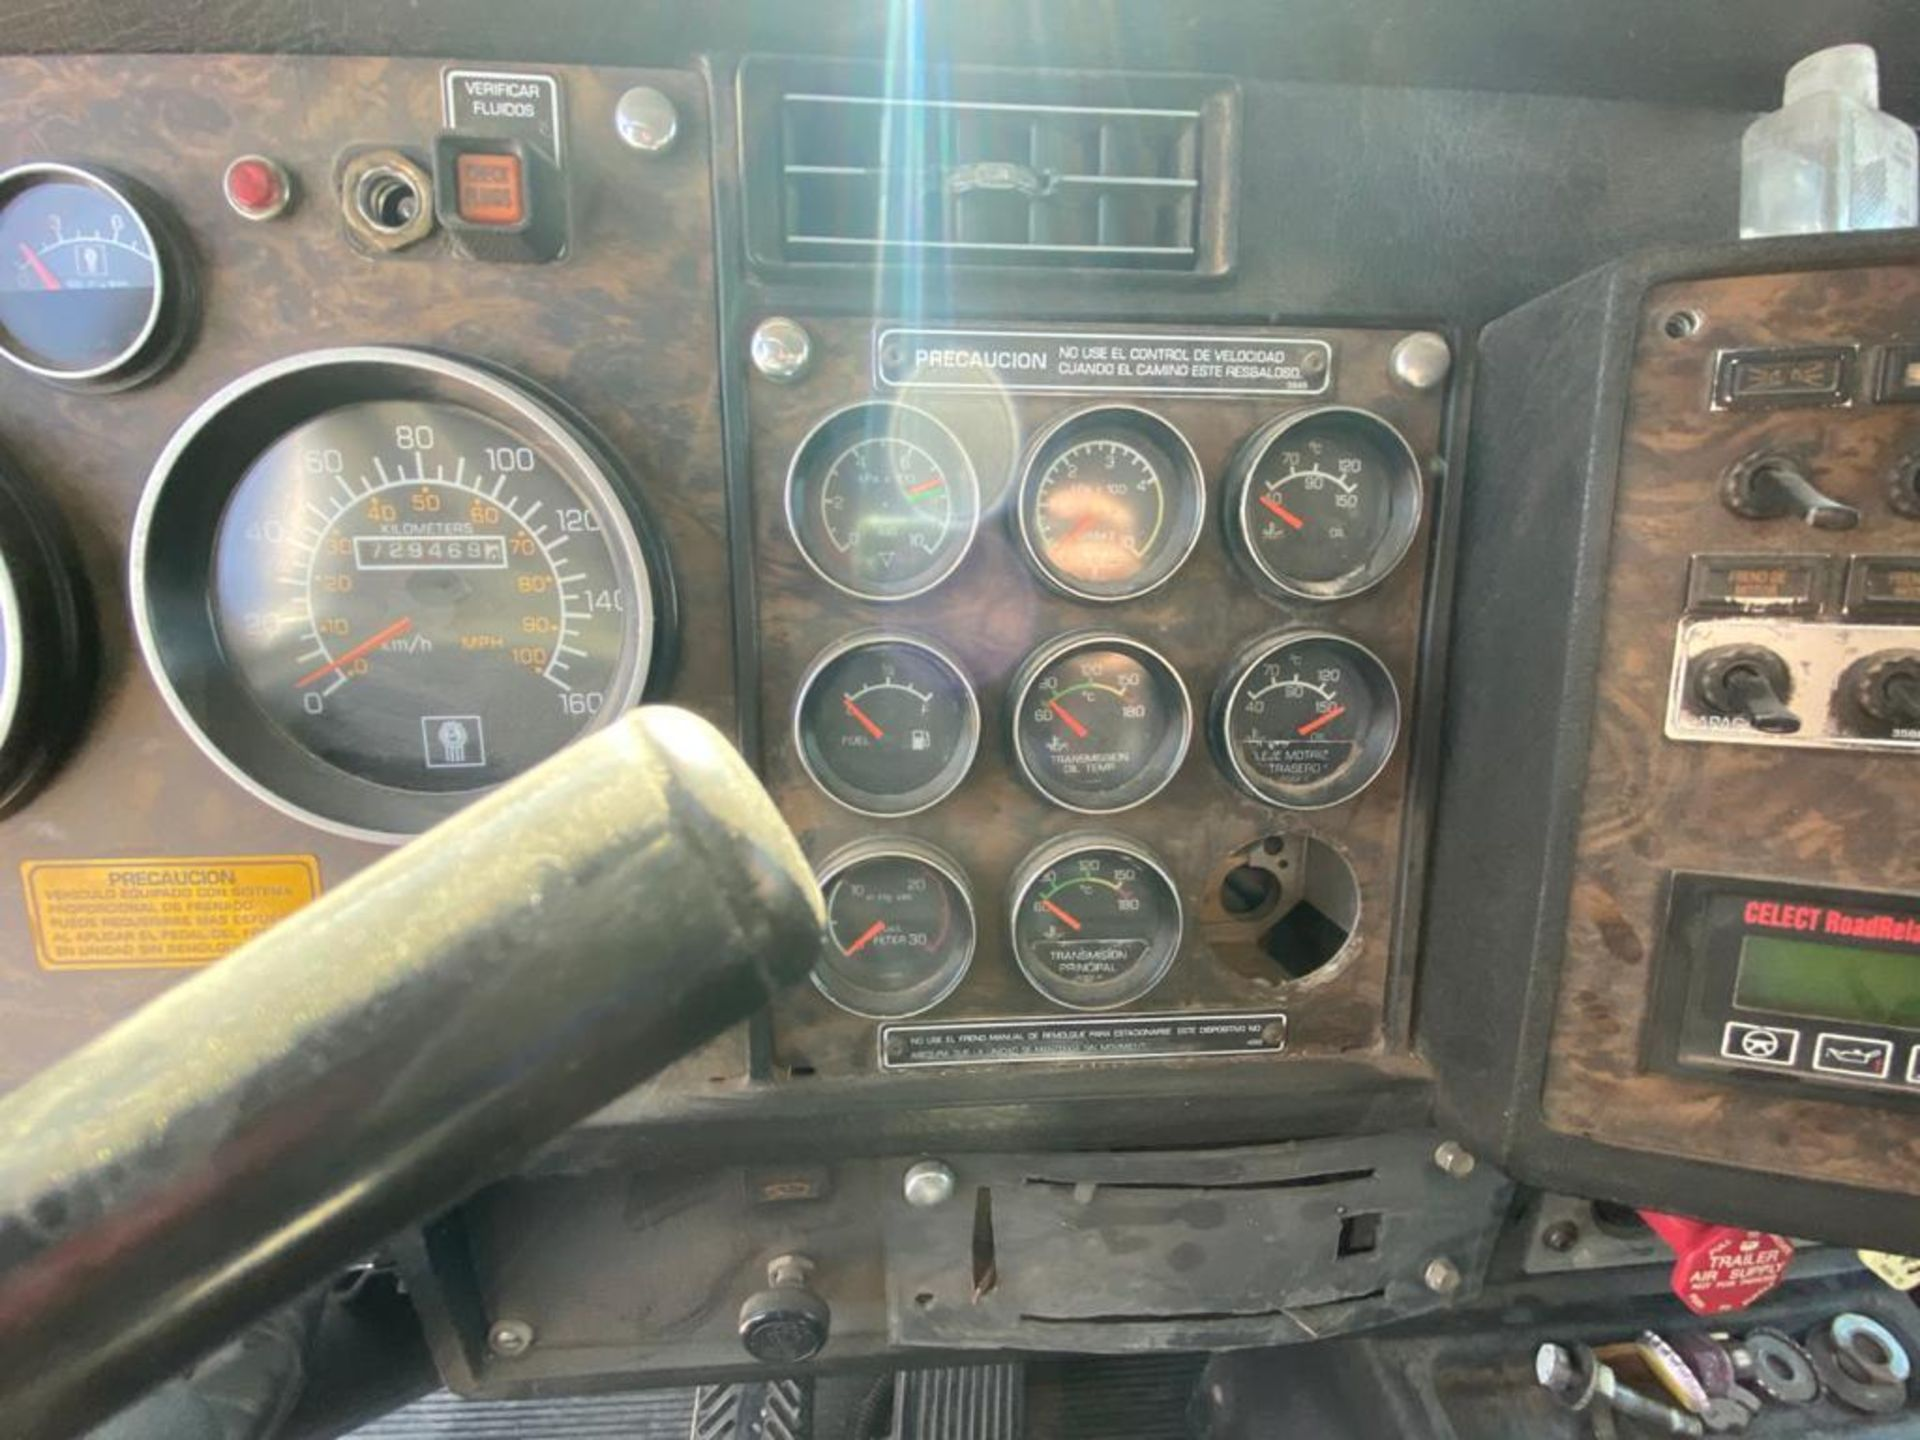 1998 Kenworth Sleeper Truck Tractor, standard transmission of 18 speeds - Image 33 of 55